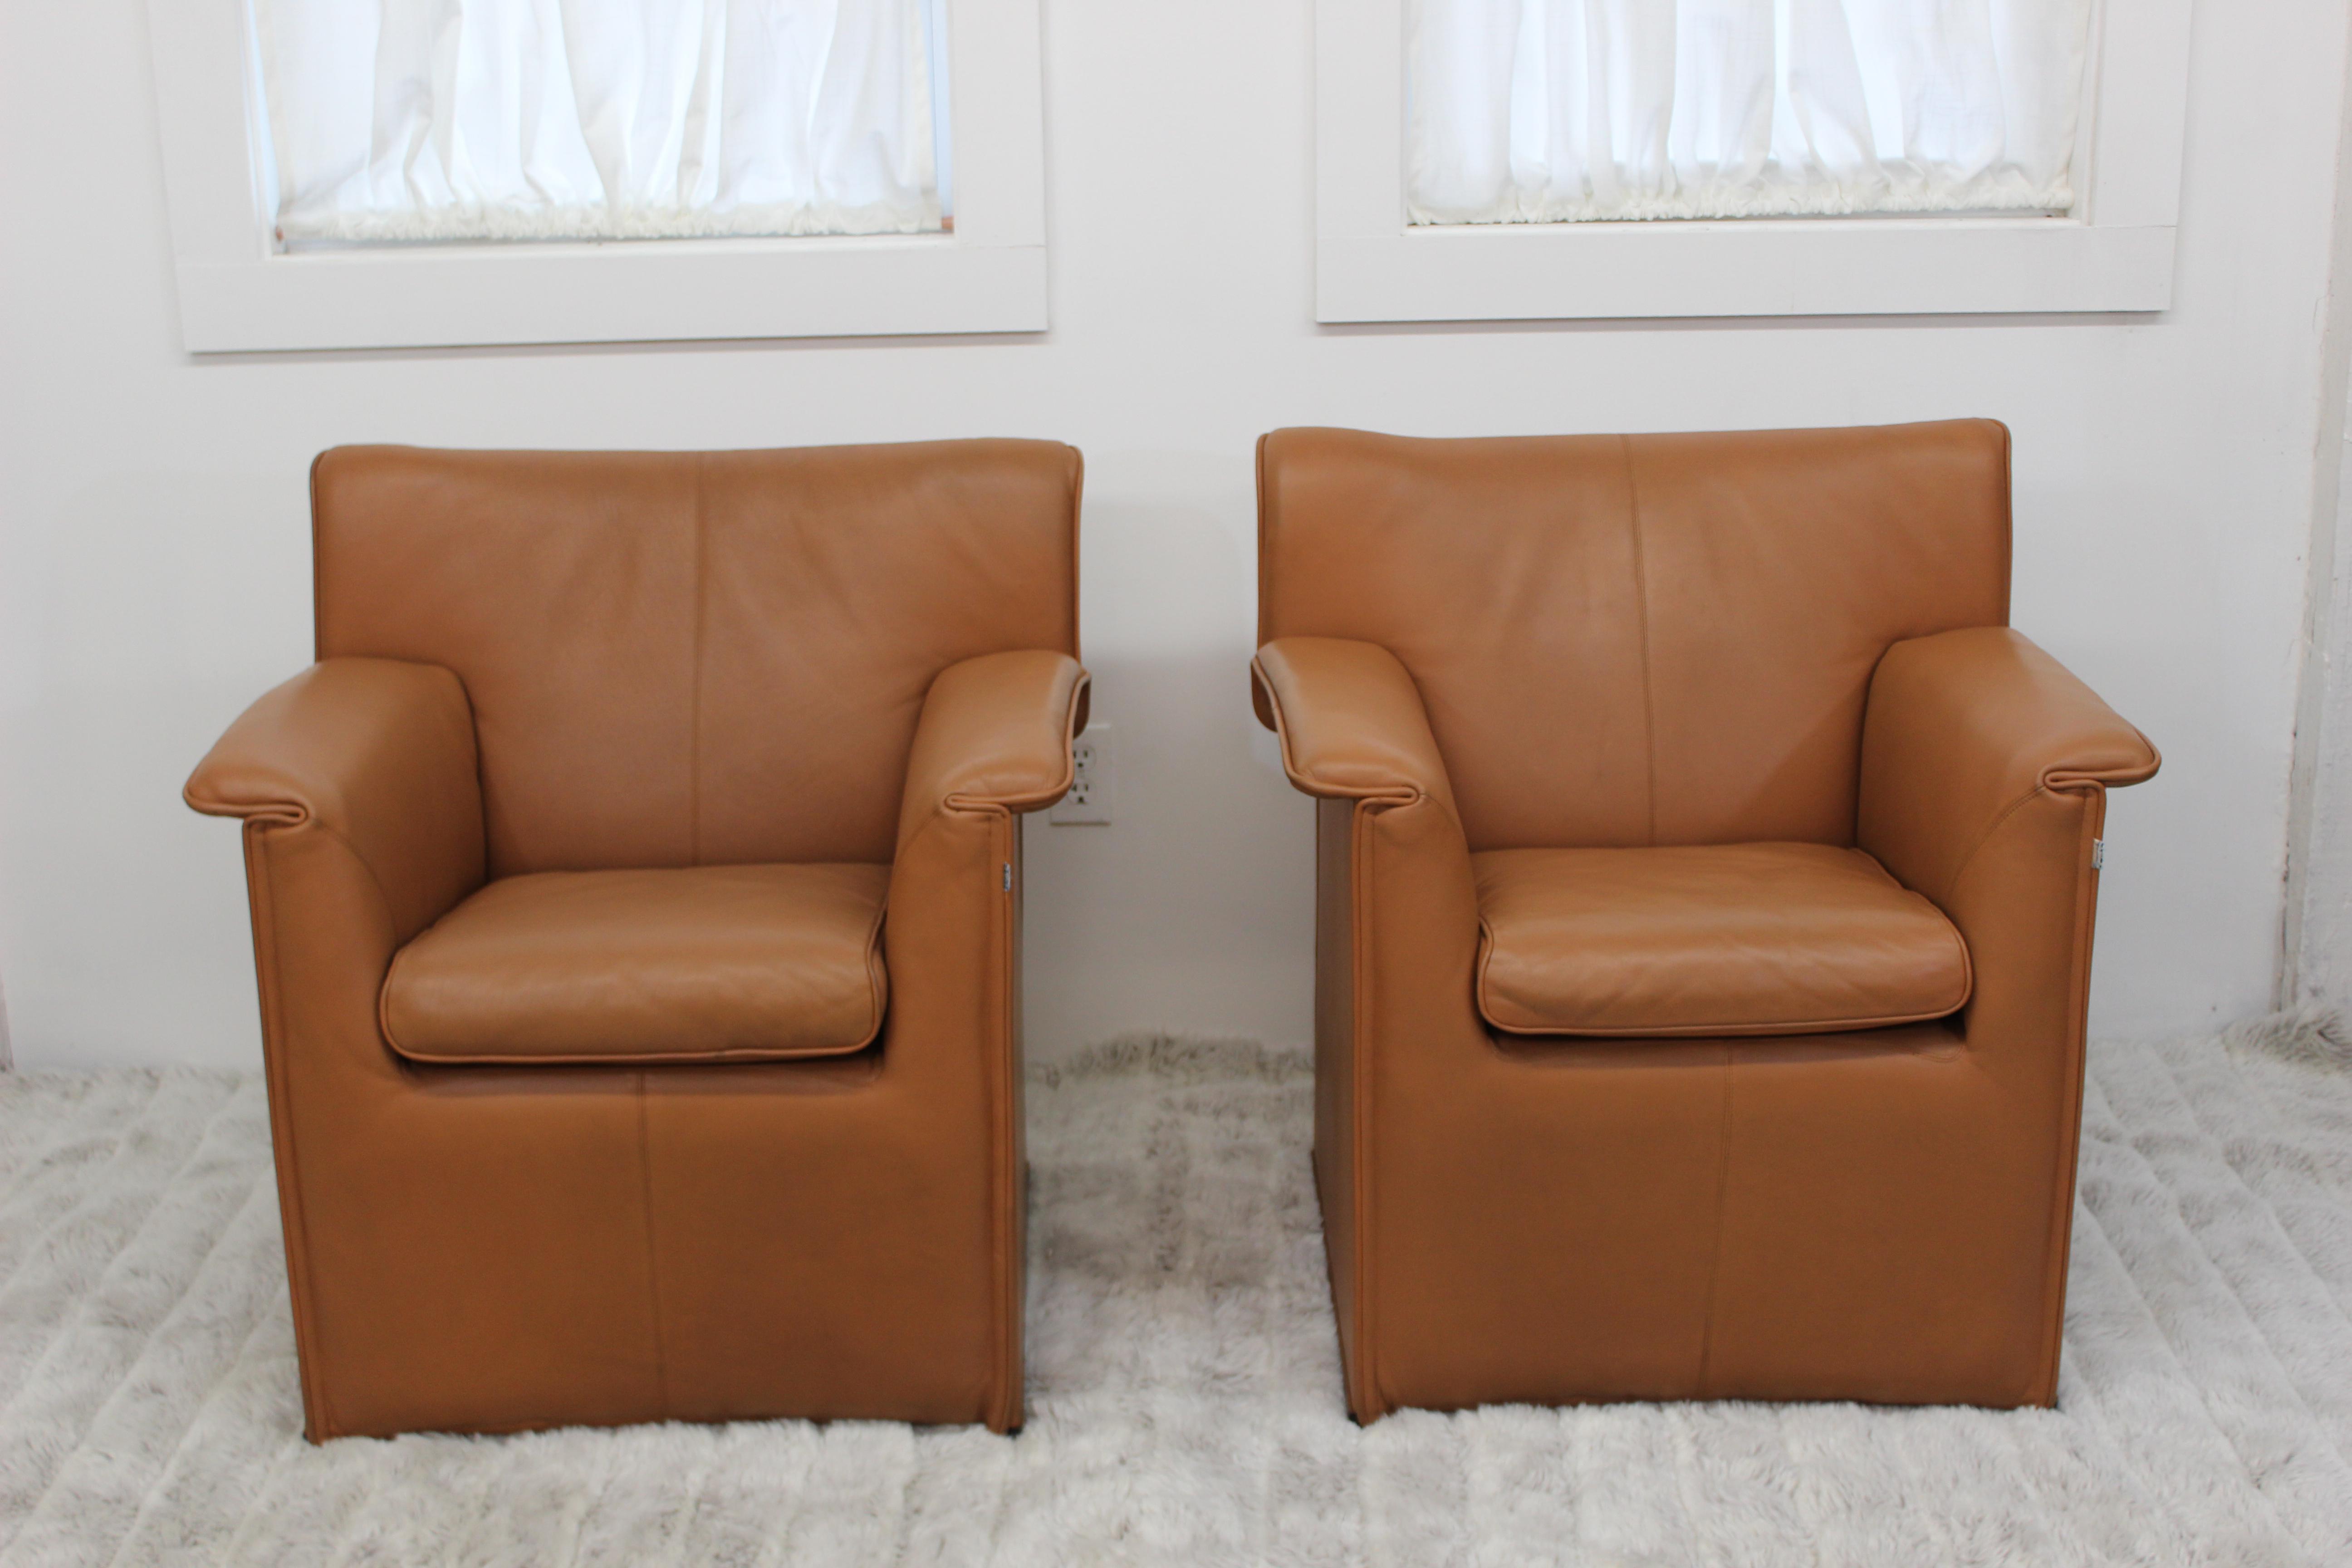 Afra U0026 Tobia Scarpa For Bu0026B Italia Mid Century Lauriana Chairs   A Pair